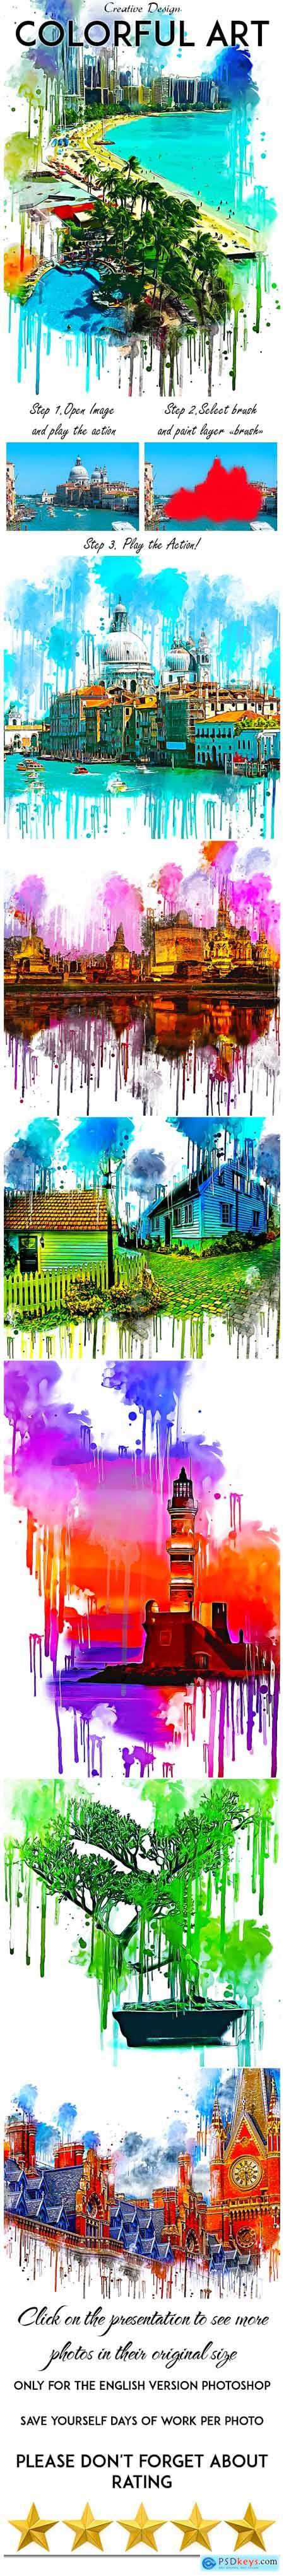 Colorful Art Photoshop Action 24802241